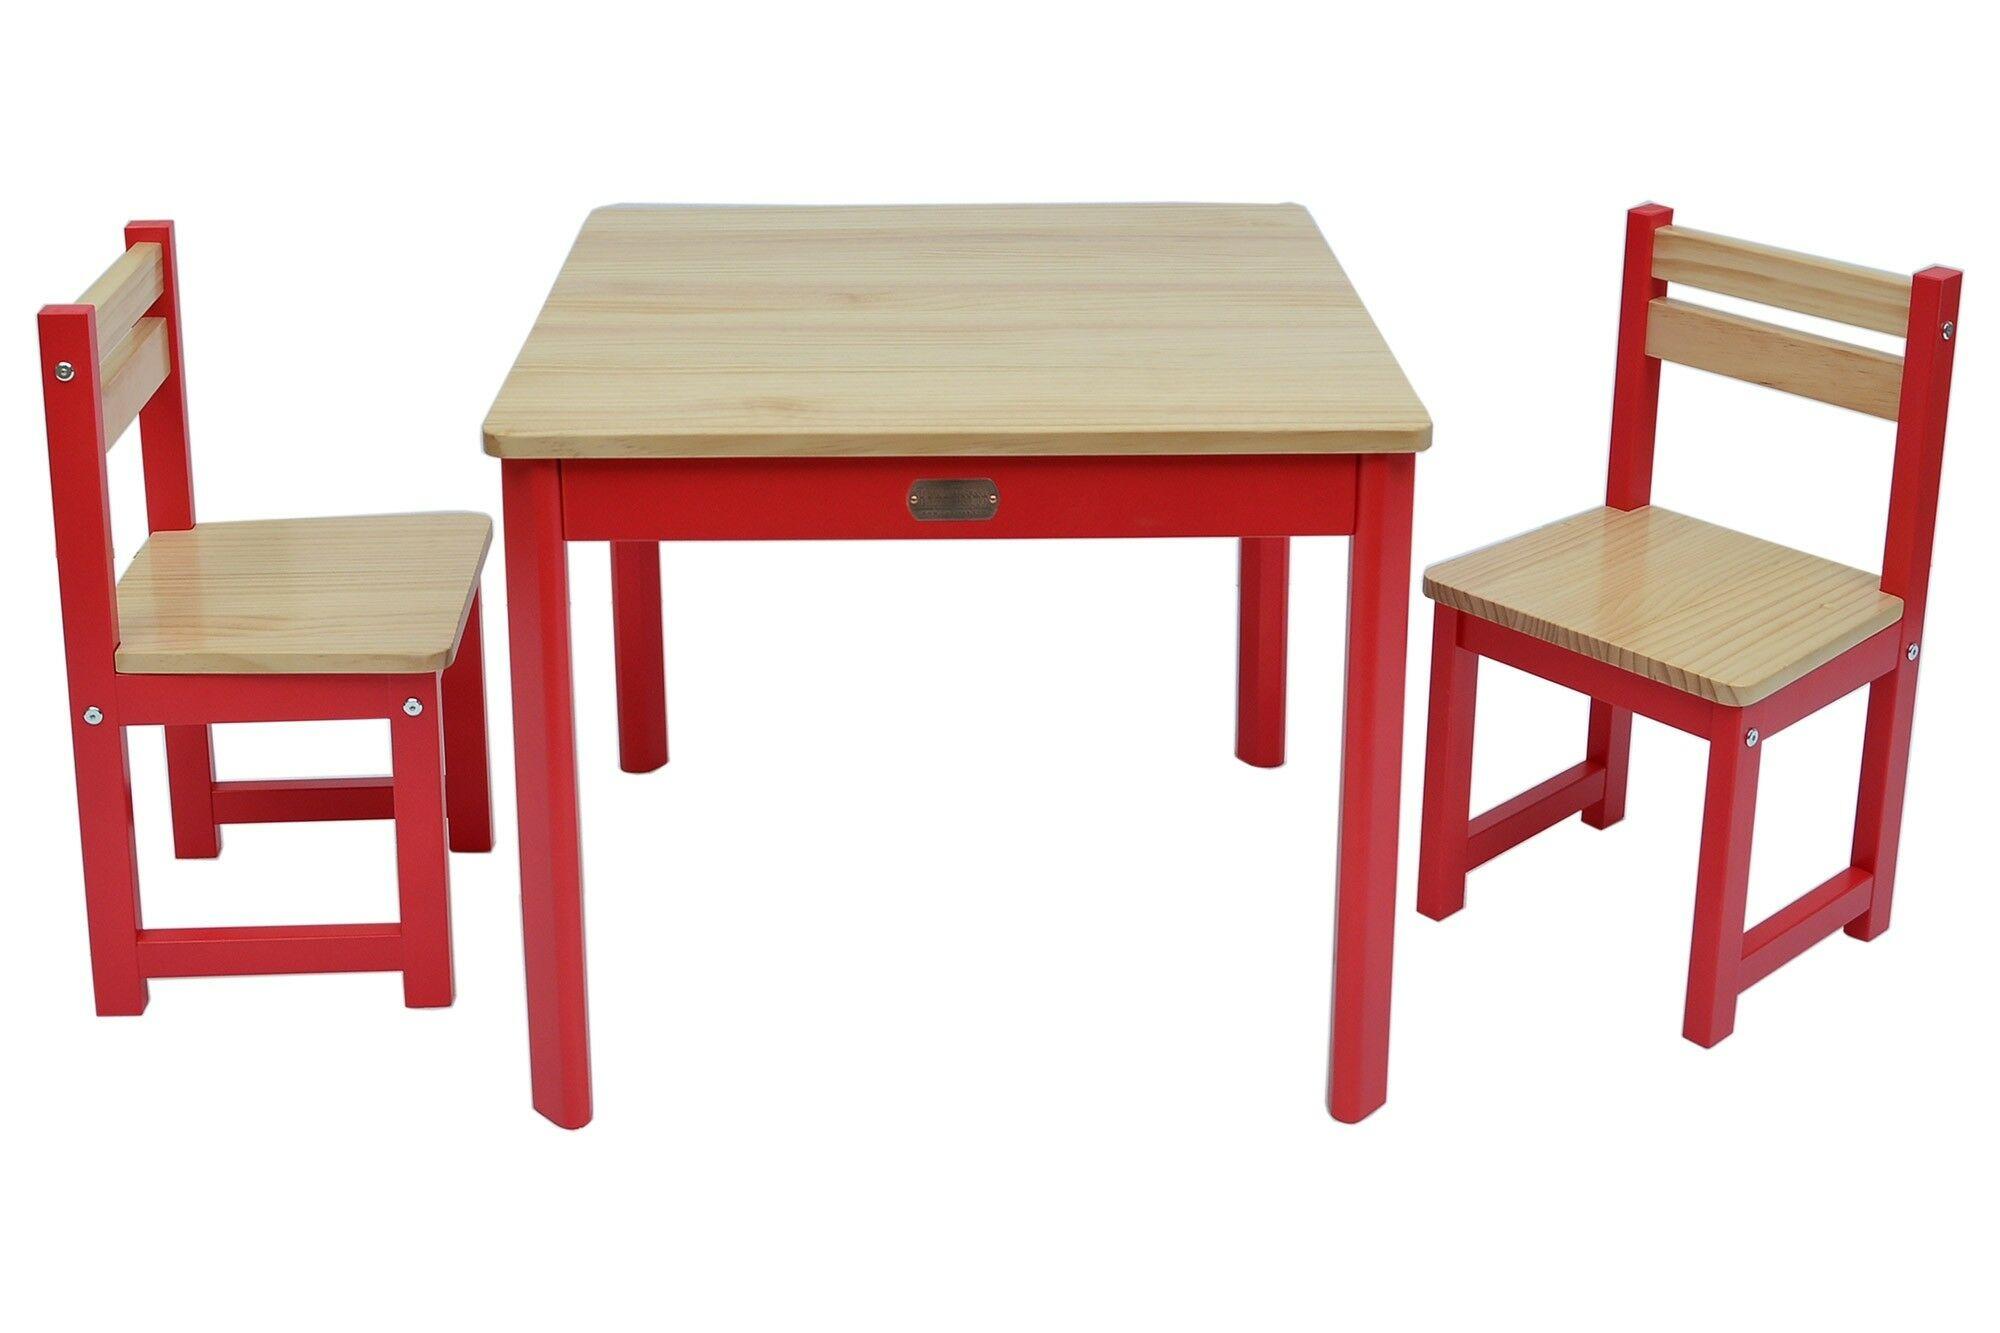 Boss Envy tafel & stoelen set - rood (TBS03R)